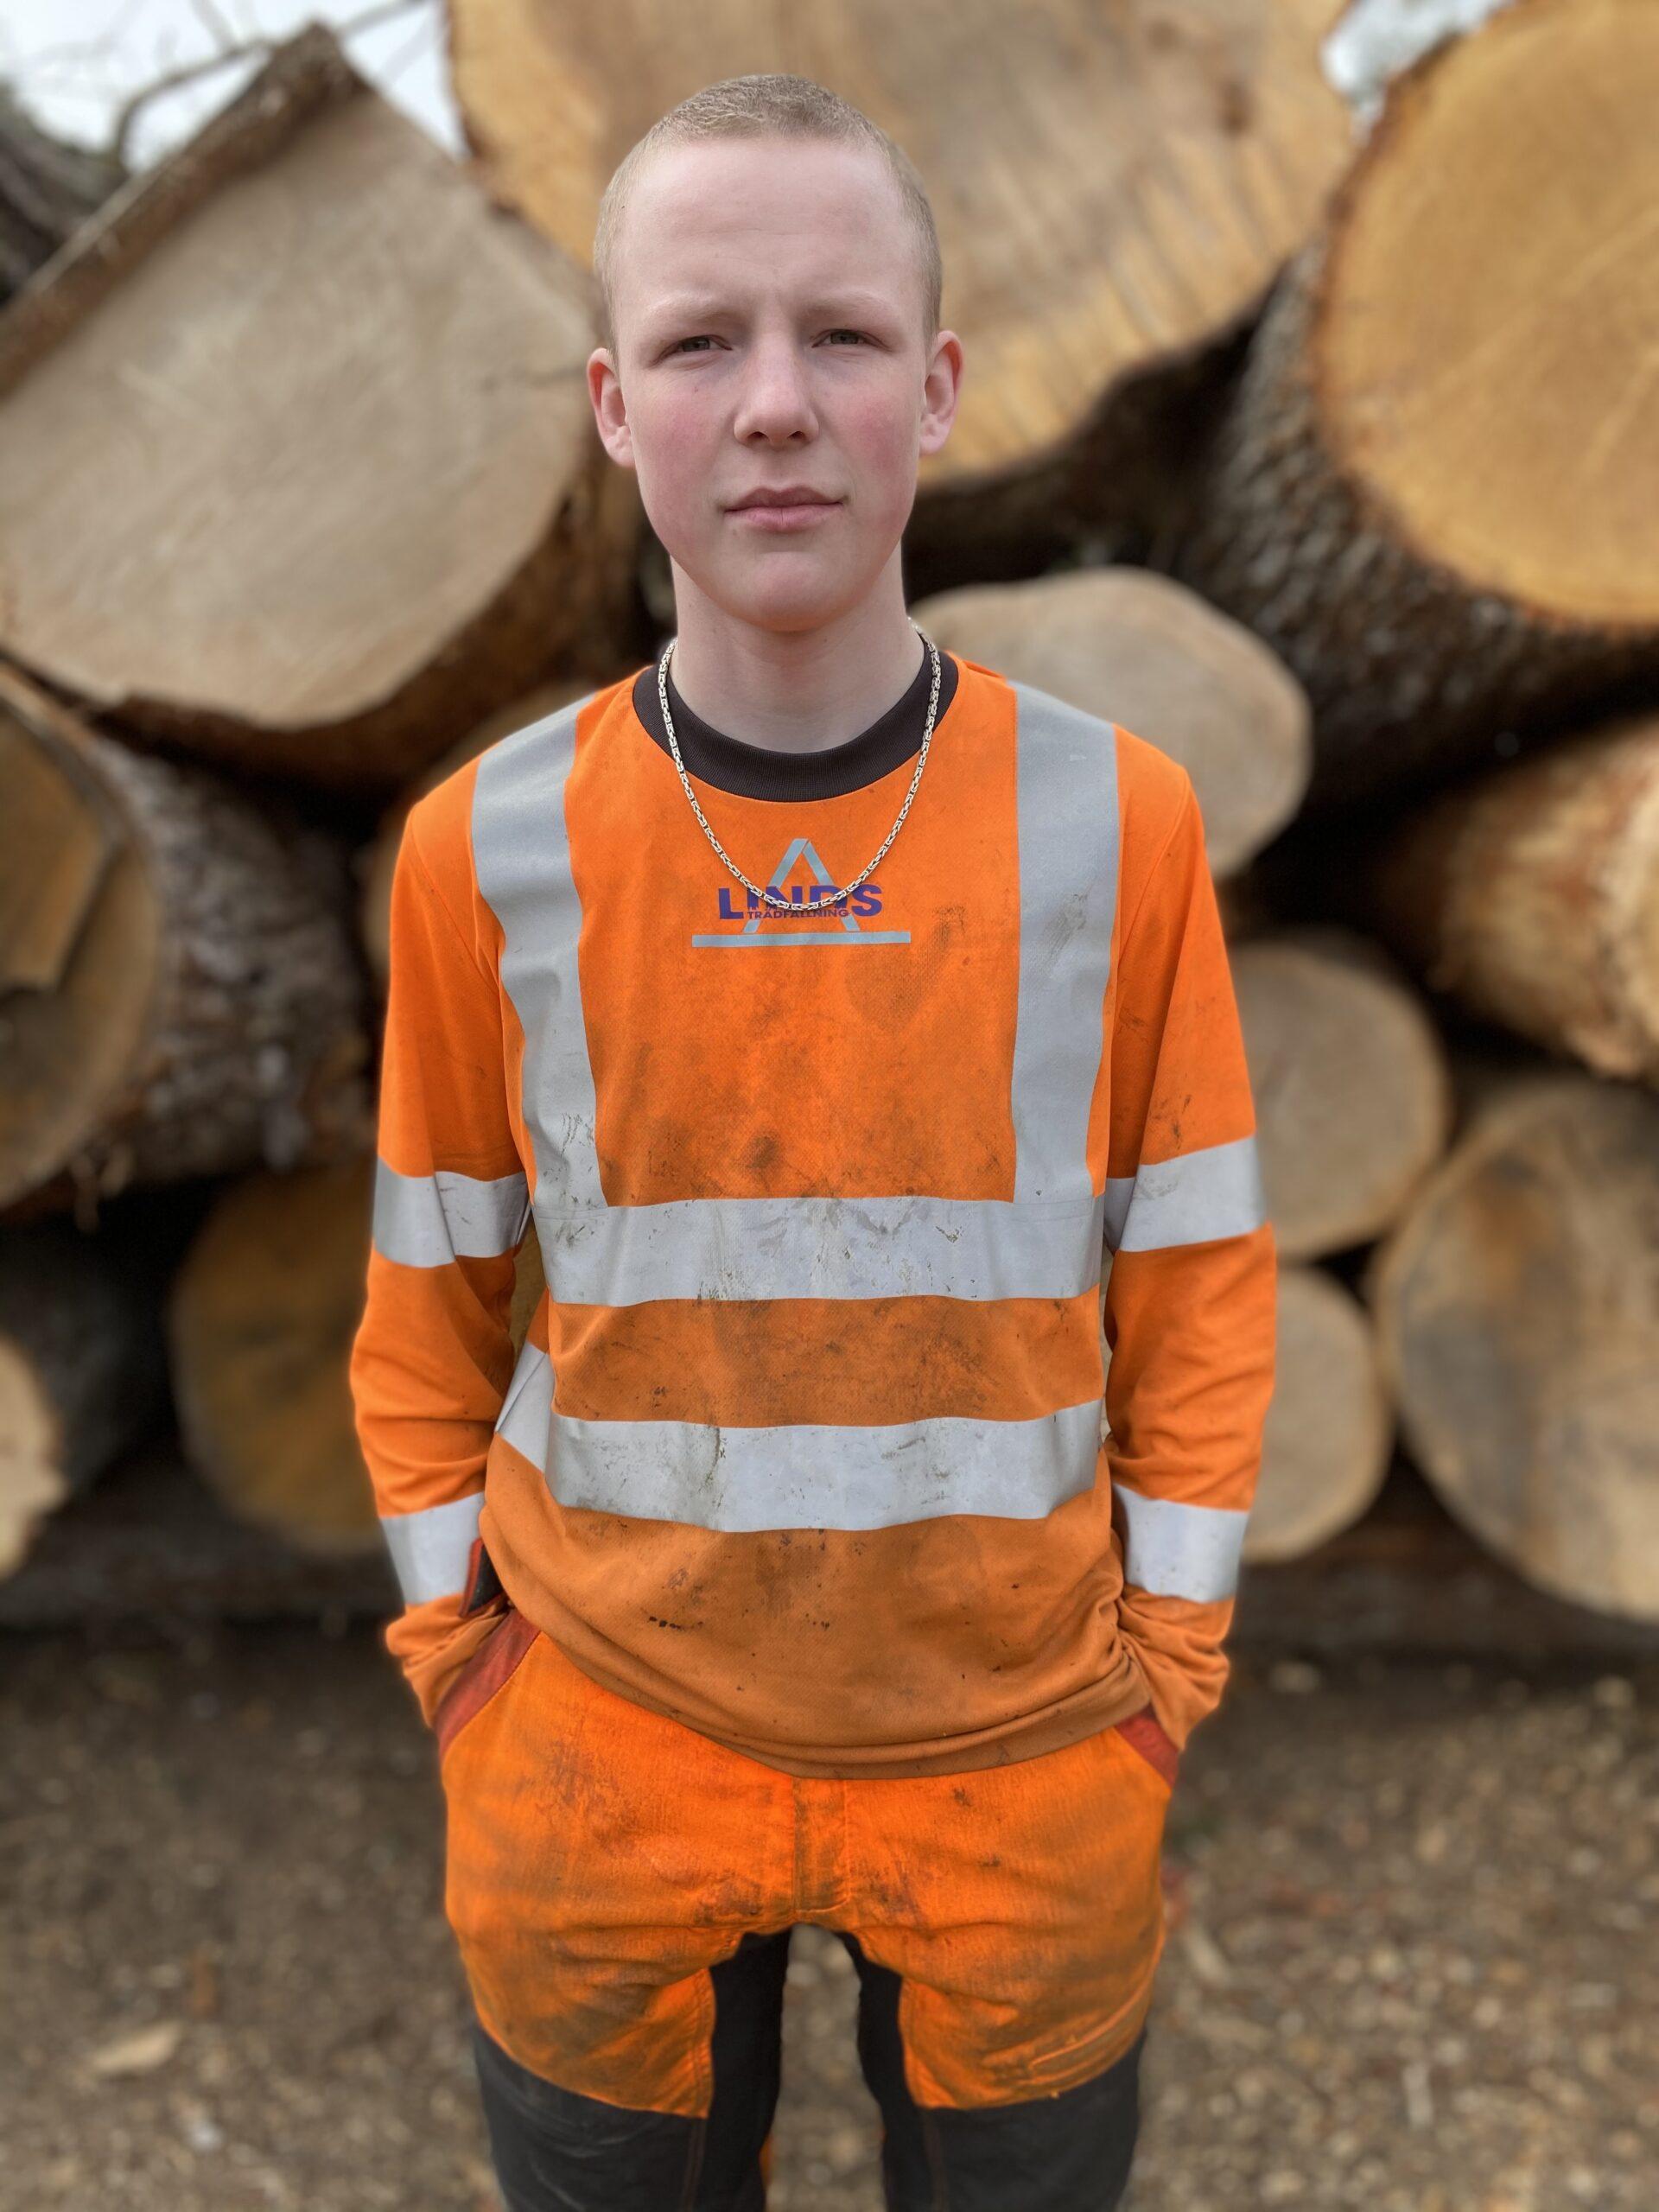 Colin Trädfällare Linds trädfällning